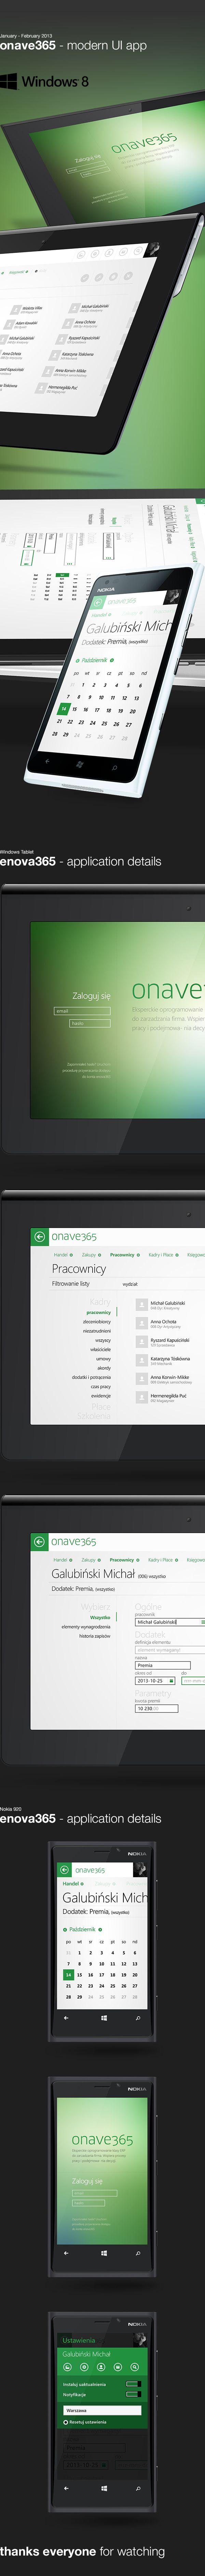 onave365 - 上Behance的Windows 8應用程序